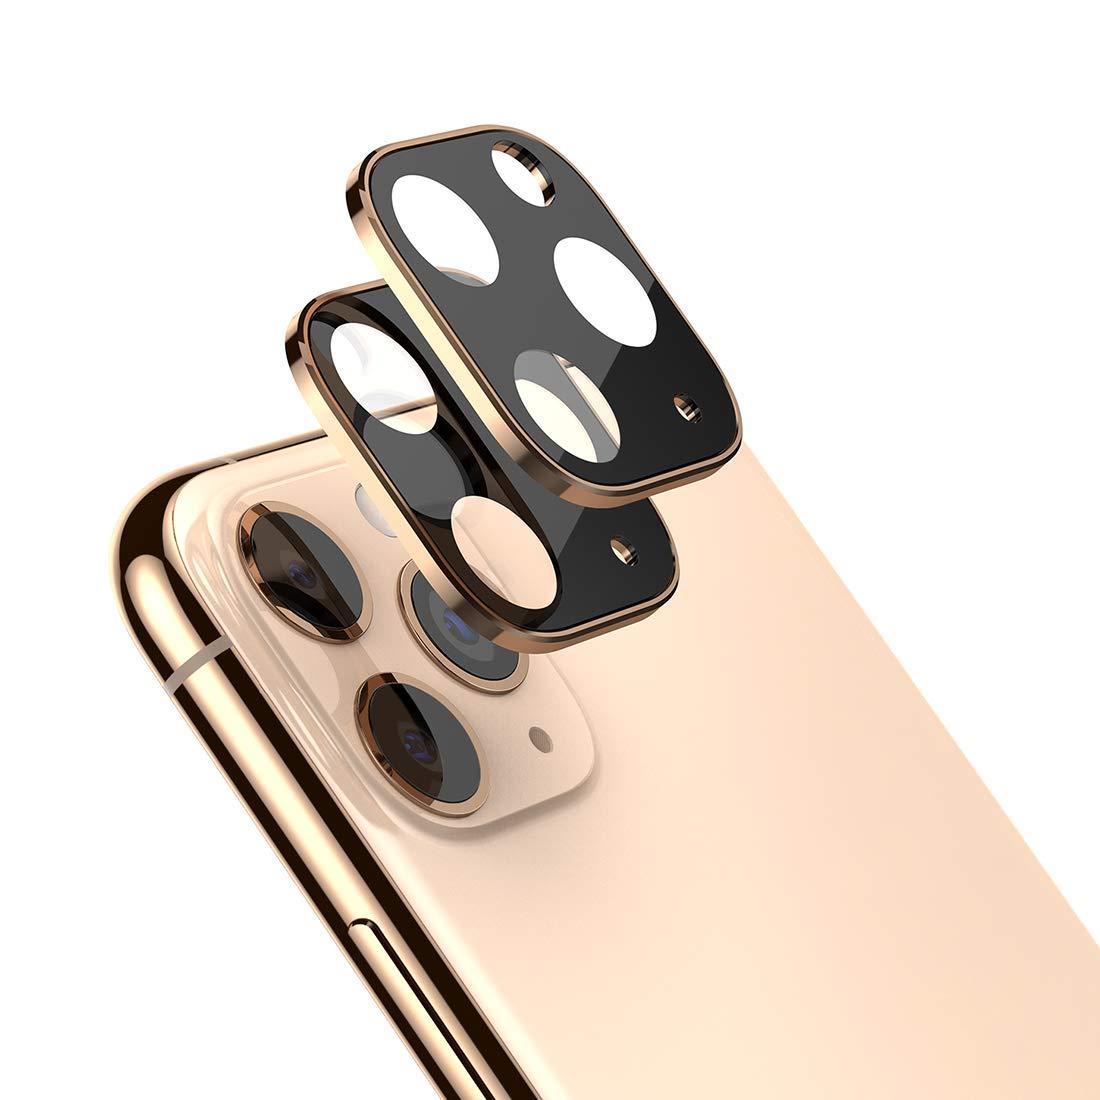 2 Vidrios Templados Para Camaras iPhone 11 Pro Max, Dorado